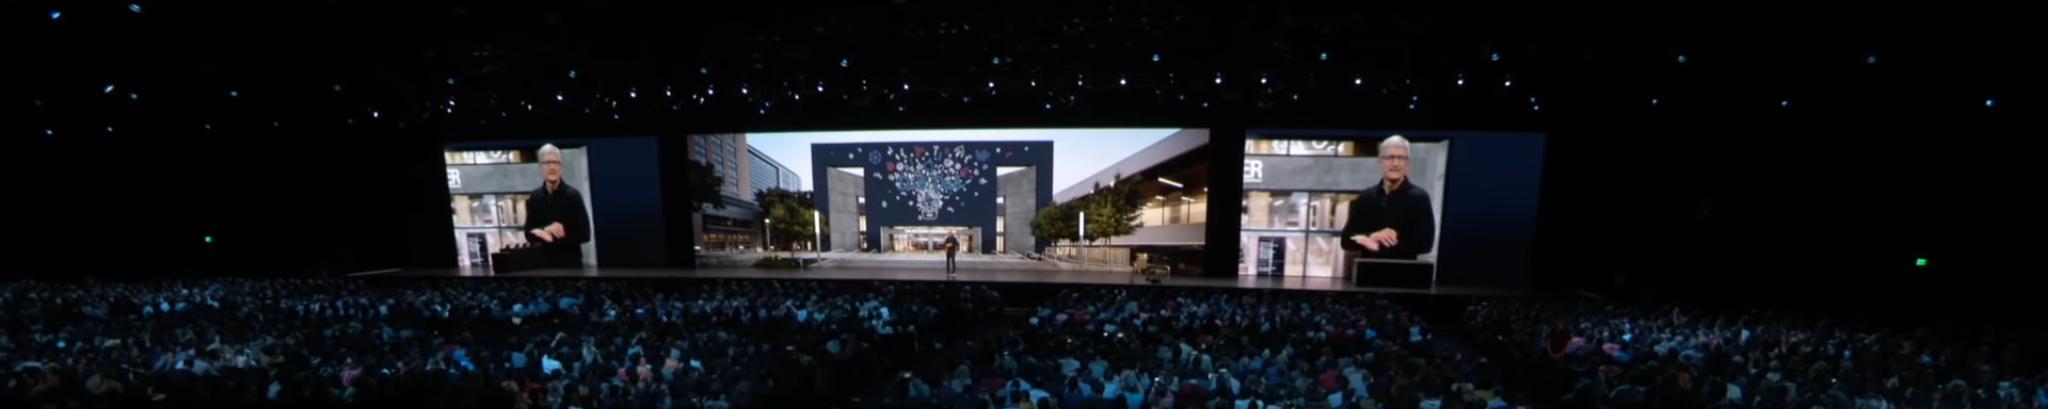 Apple WWDC 2019 Keynote Summary - Charlotte Street Computers